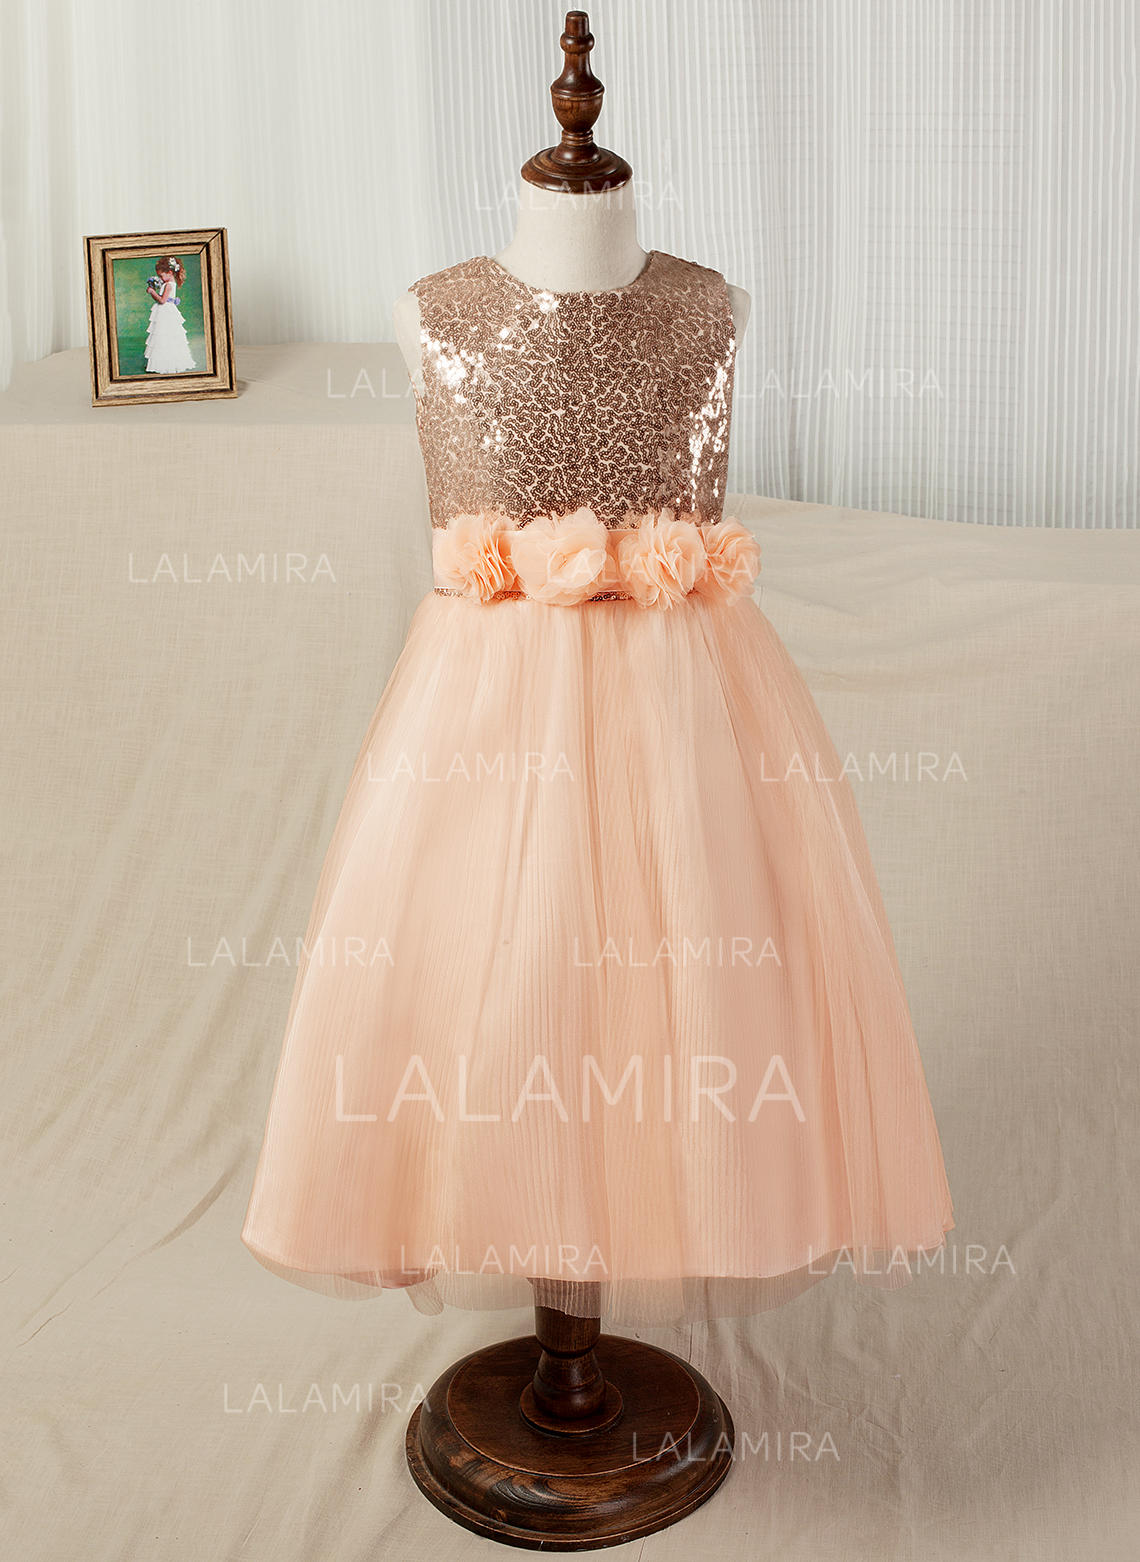 ea66ab9c8f A-Line Princess Tea-length Flower Girl Dress - Tulle Sequined Sleeveless.  Loading zoom